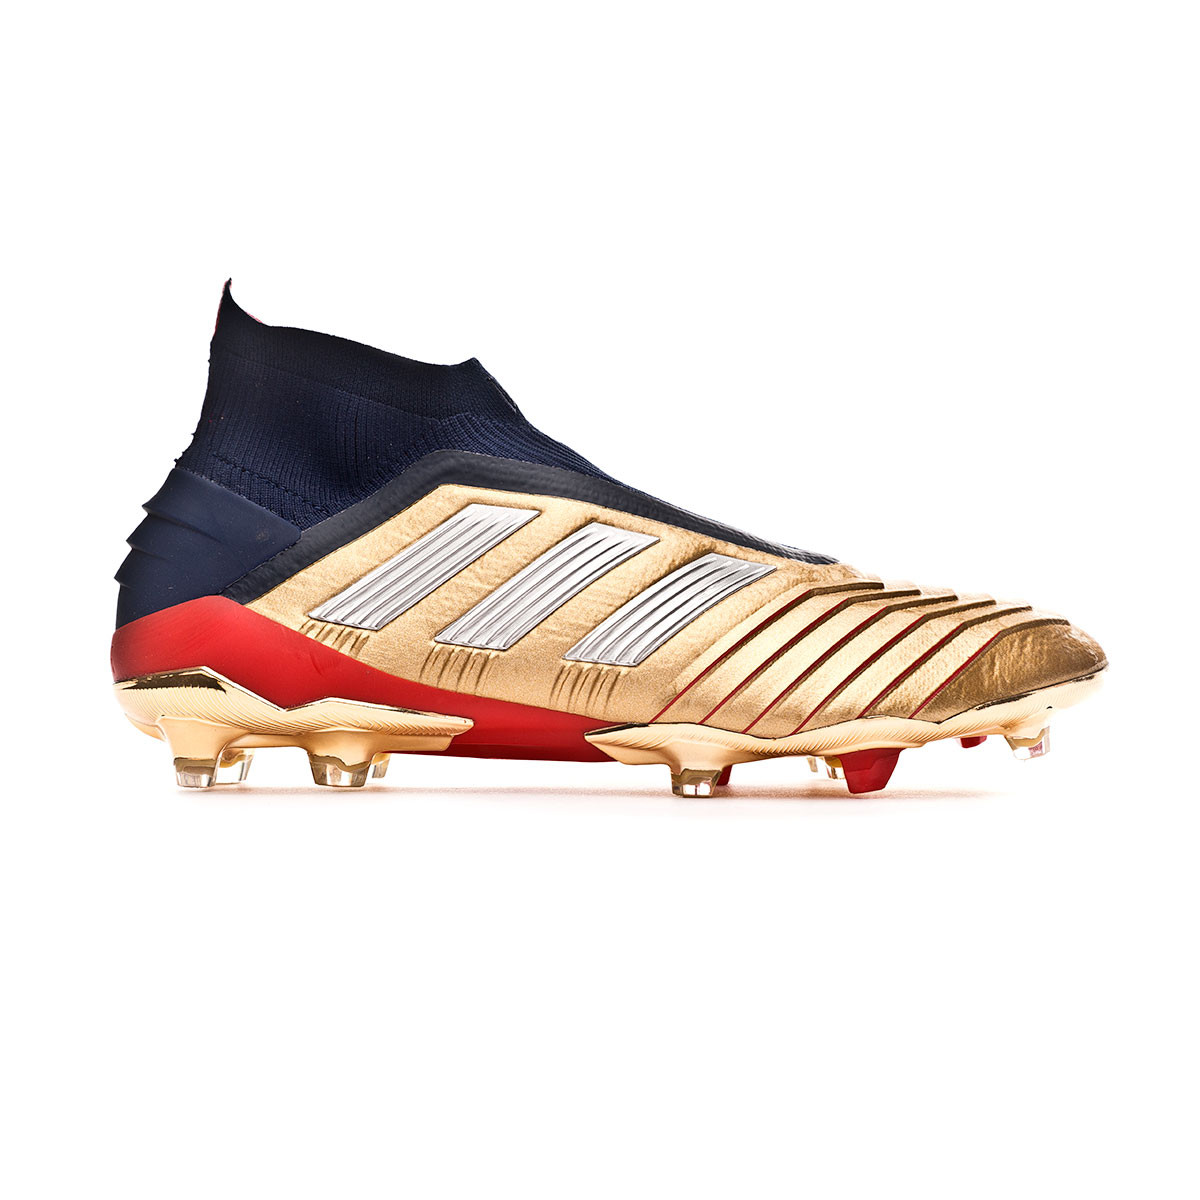 Chaussure de foot adidas Predator 19+ FG ZZ